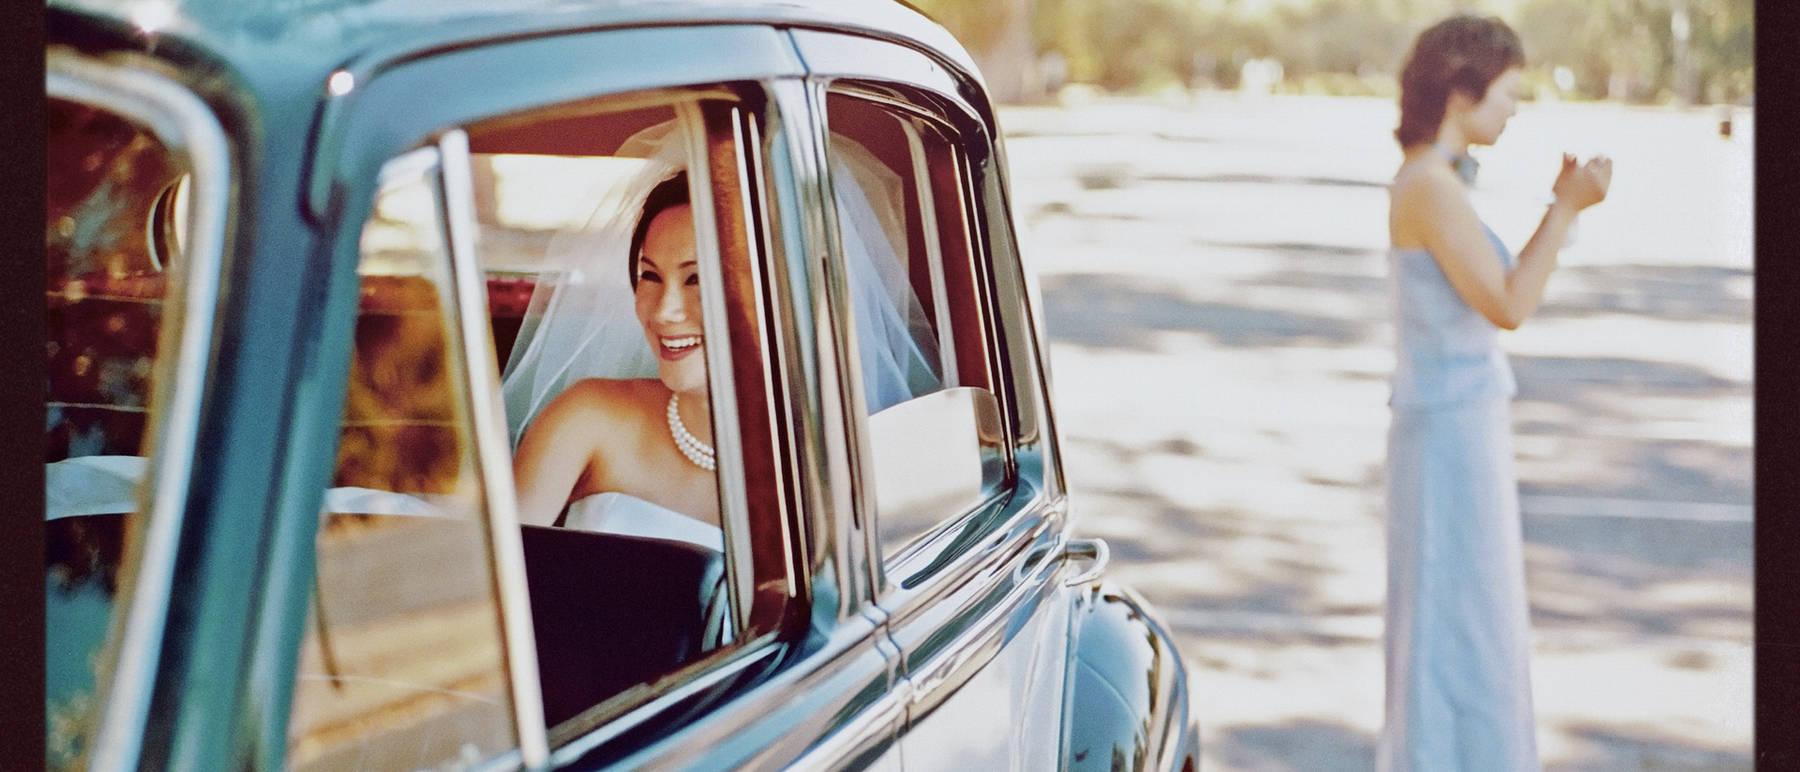 johnandjoseph-wedding-photographer-hz-slider-344